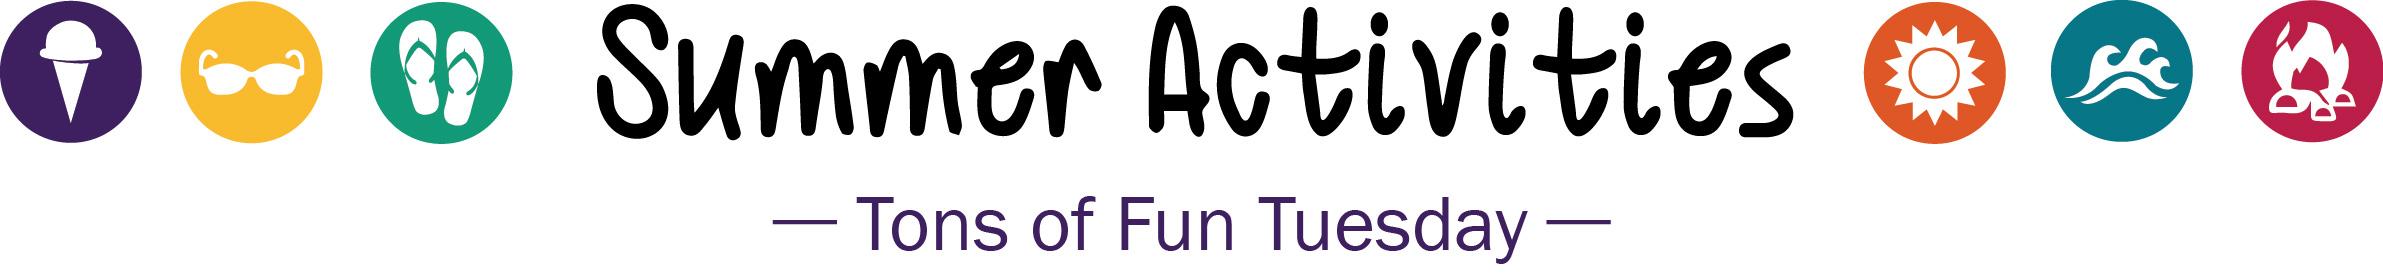 summer activities logo tons of fun tue